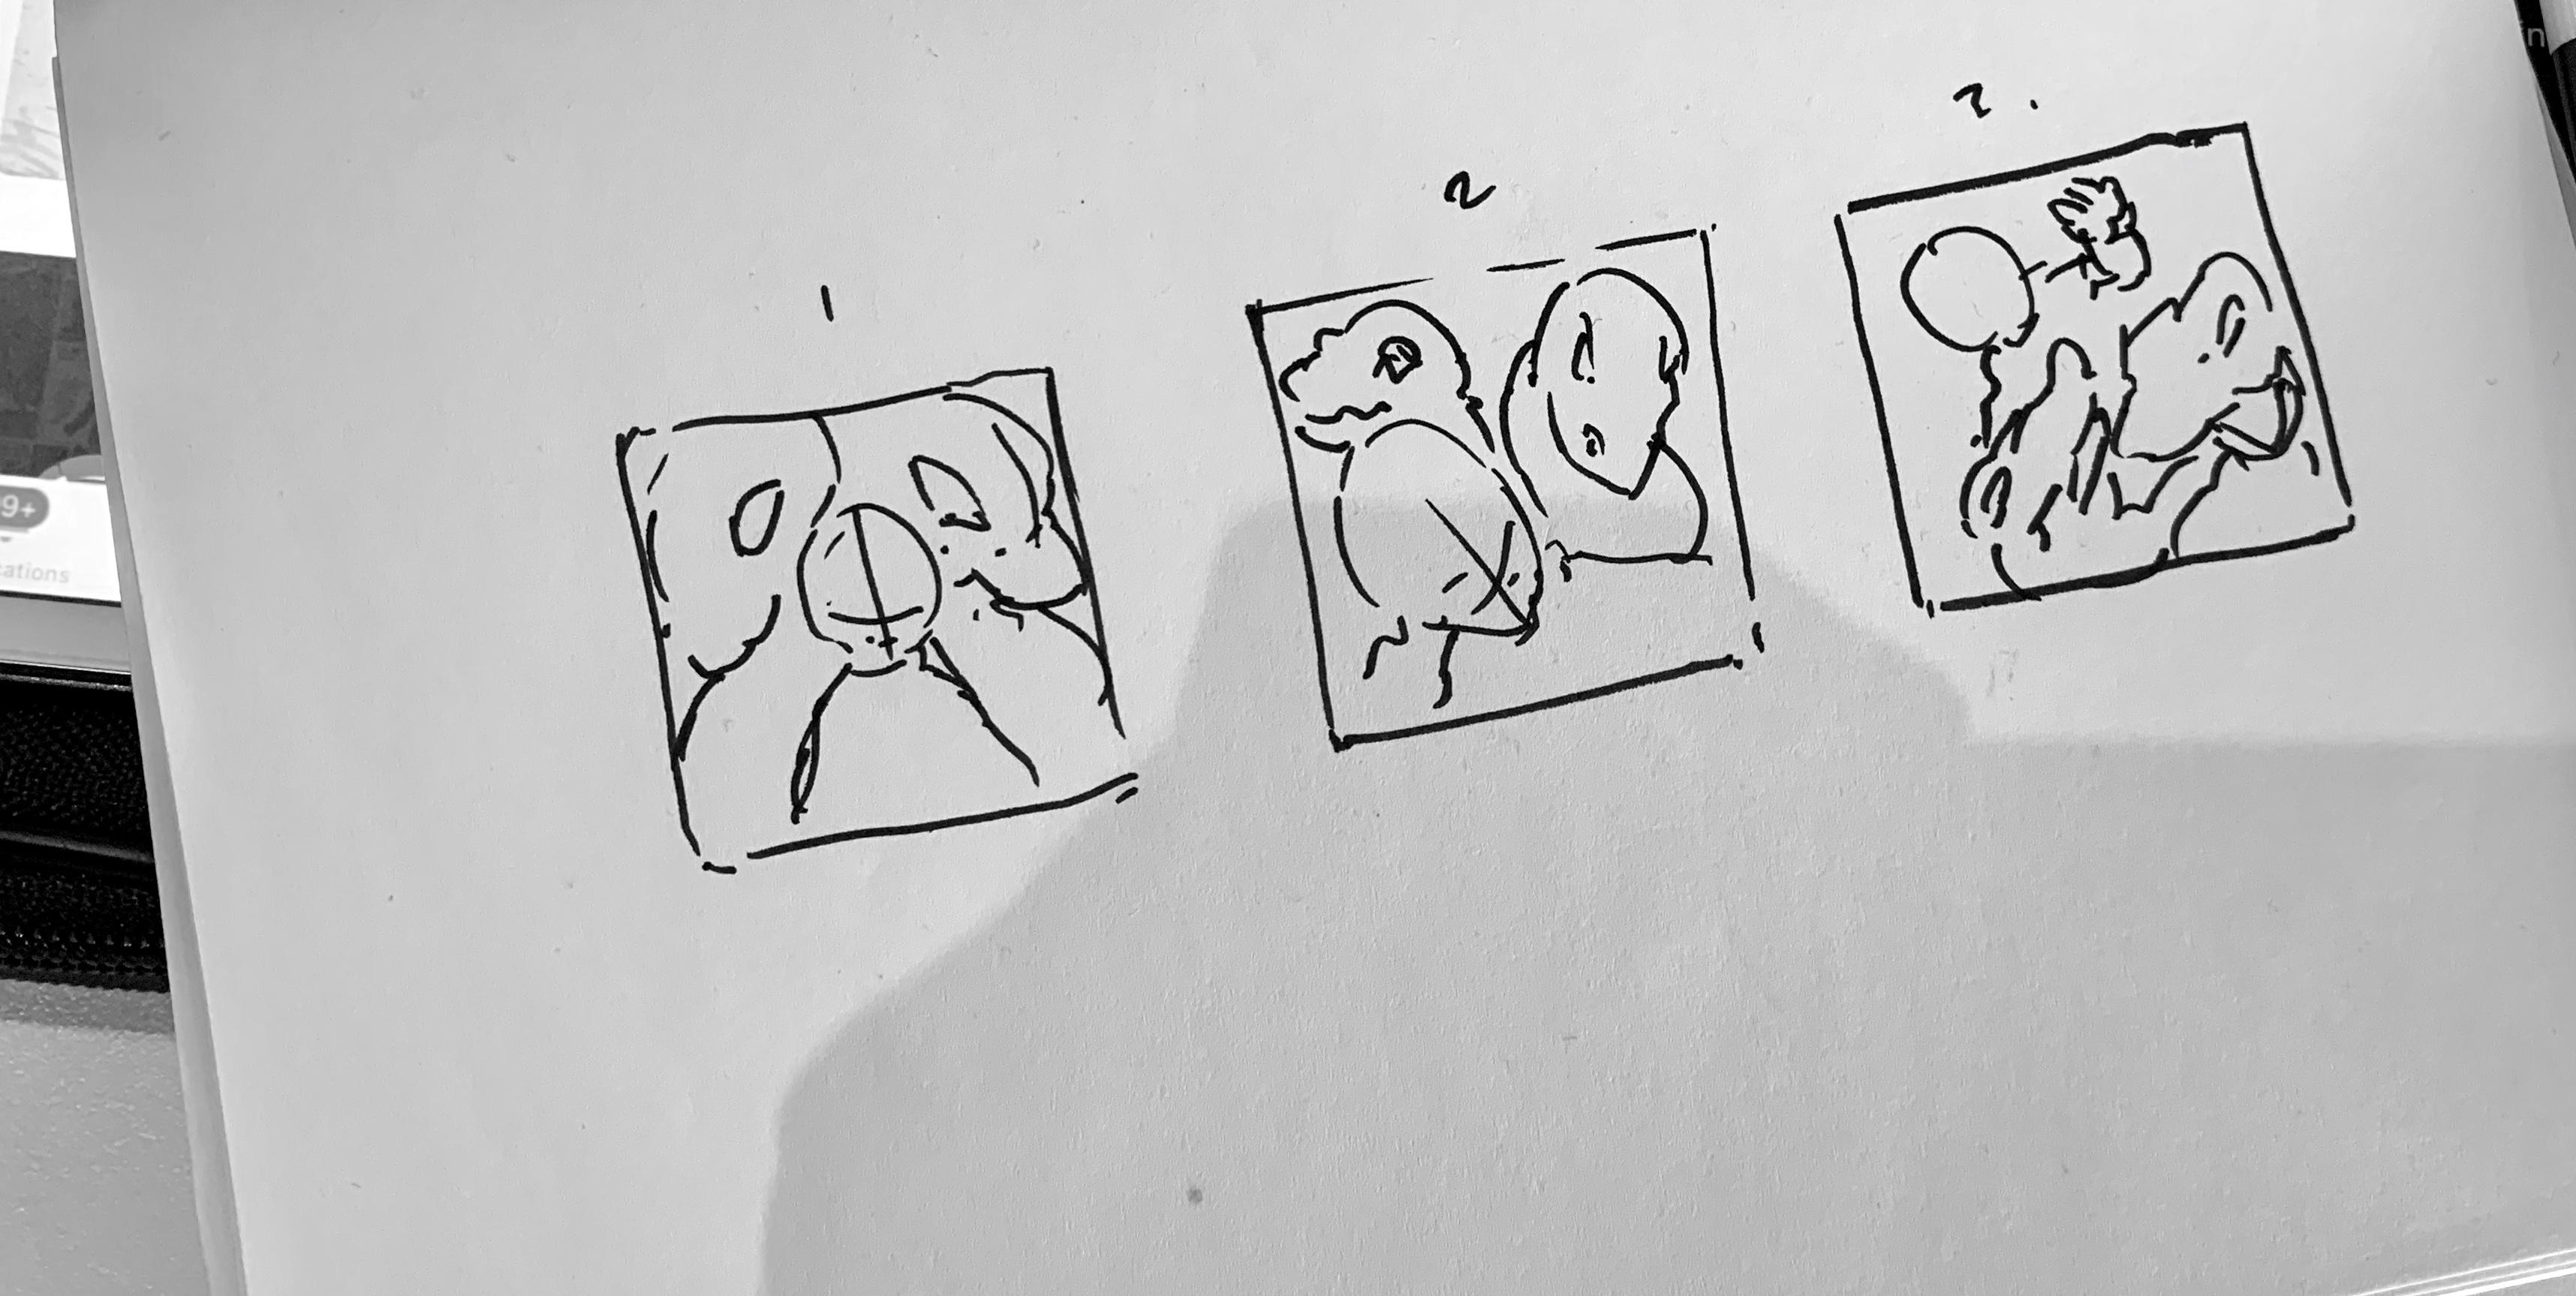 5 Langkah Membuat Ilustrasi Manual Jadi Digital versi Kemas Acil